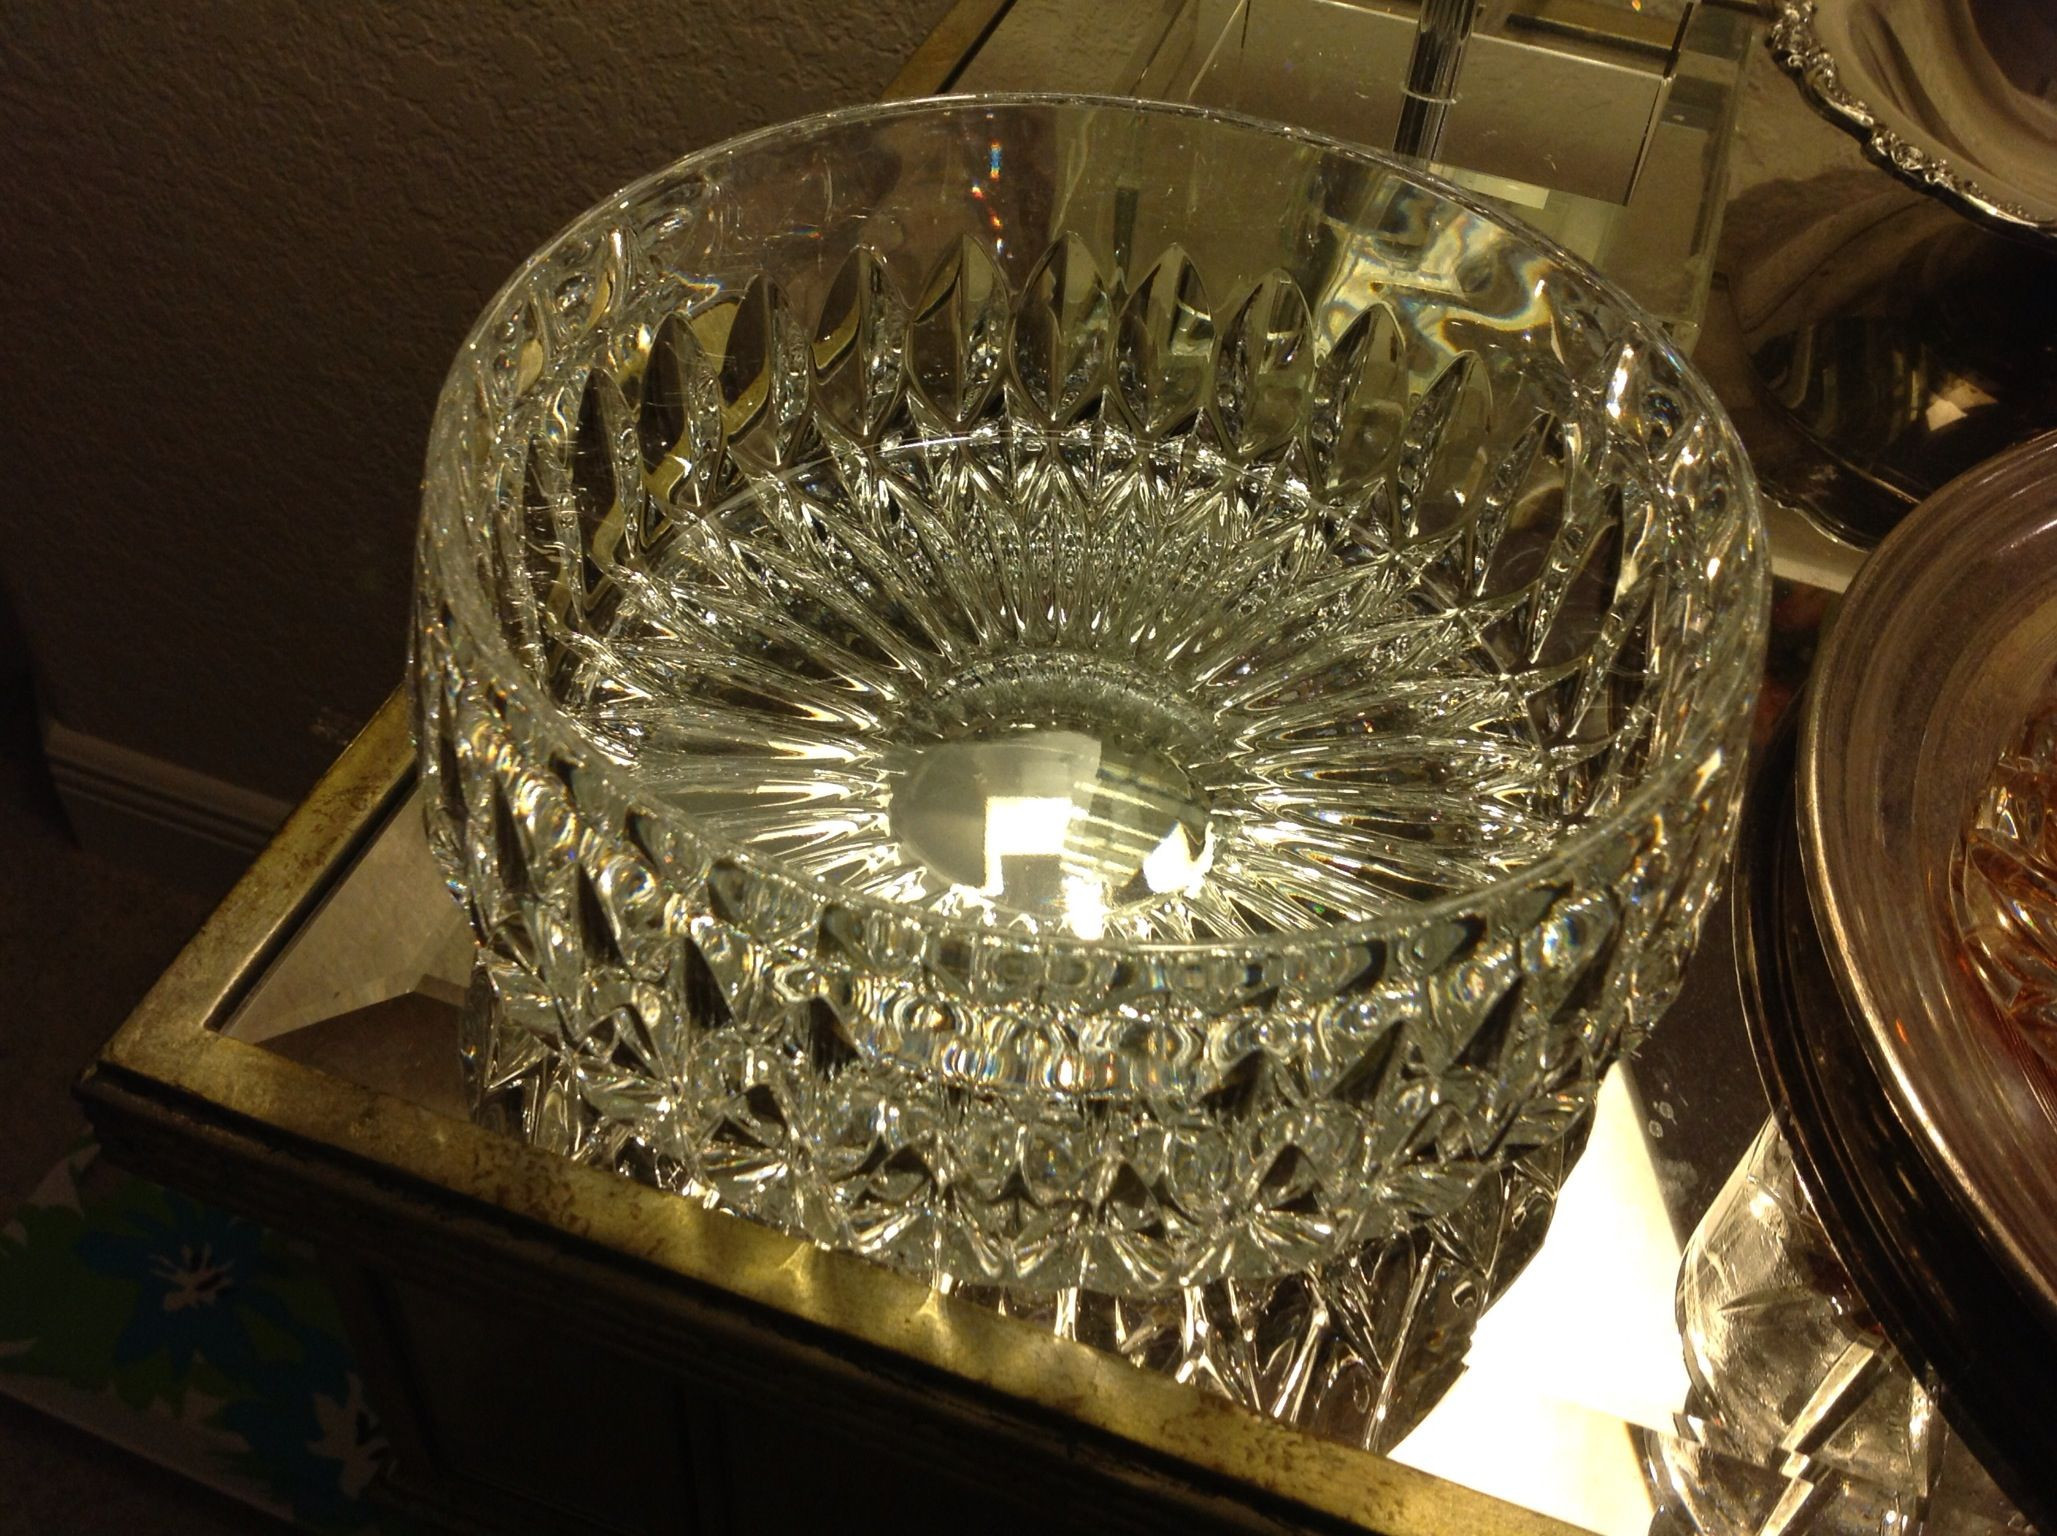 16 Cute Gorham Crystal Vase 2021 free download gorham crystal vase of large gorham crystal bowl 9 great finds goodwill haul pinterest in large gorham crystal bowl 9